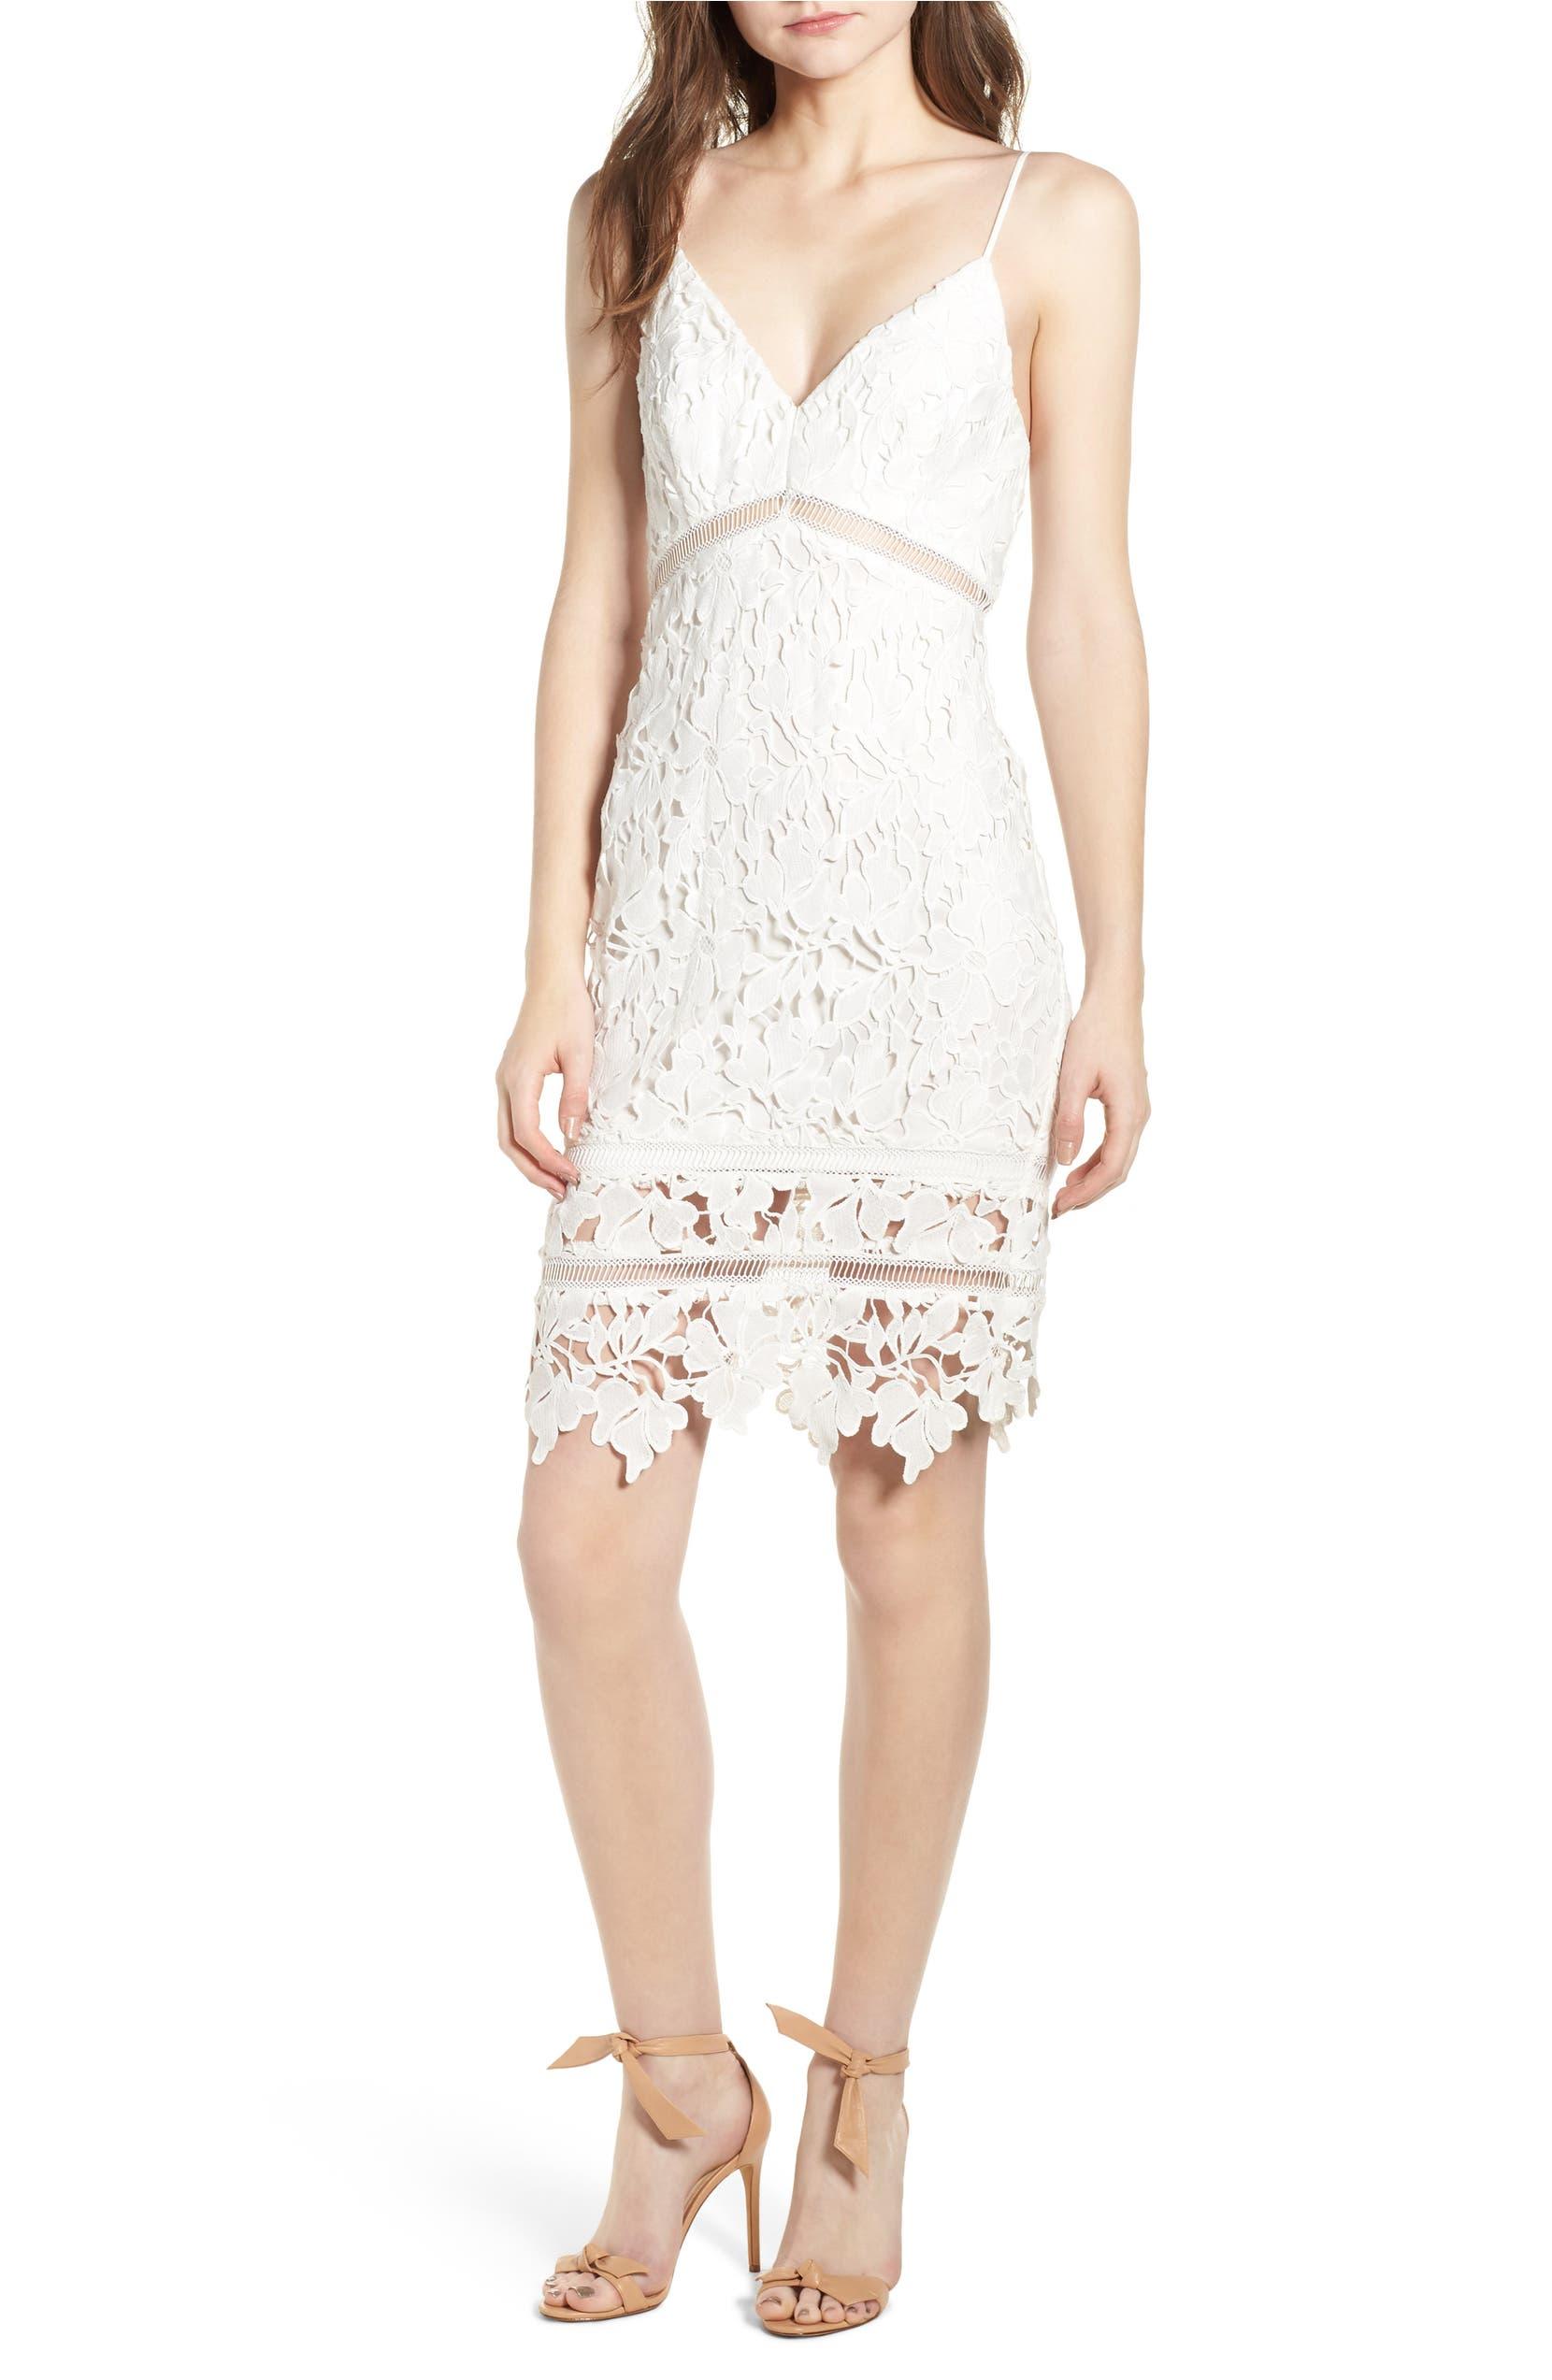 8fef4925d6f97 ASTR Lace Bodycon Dress